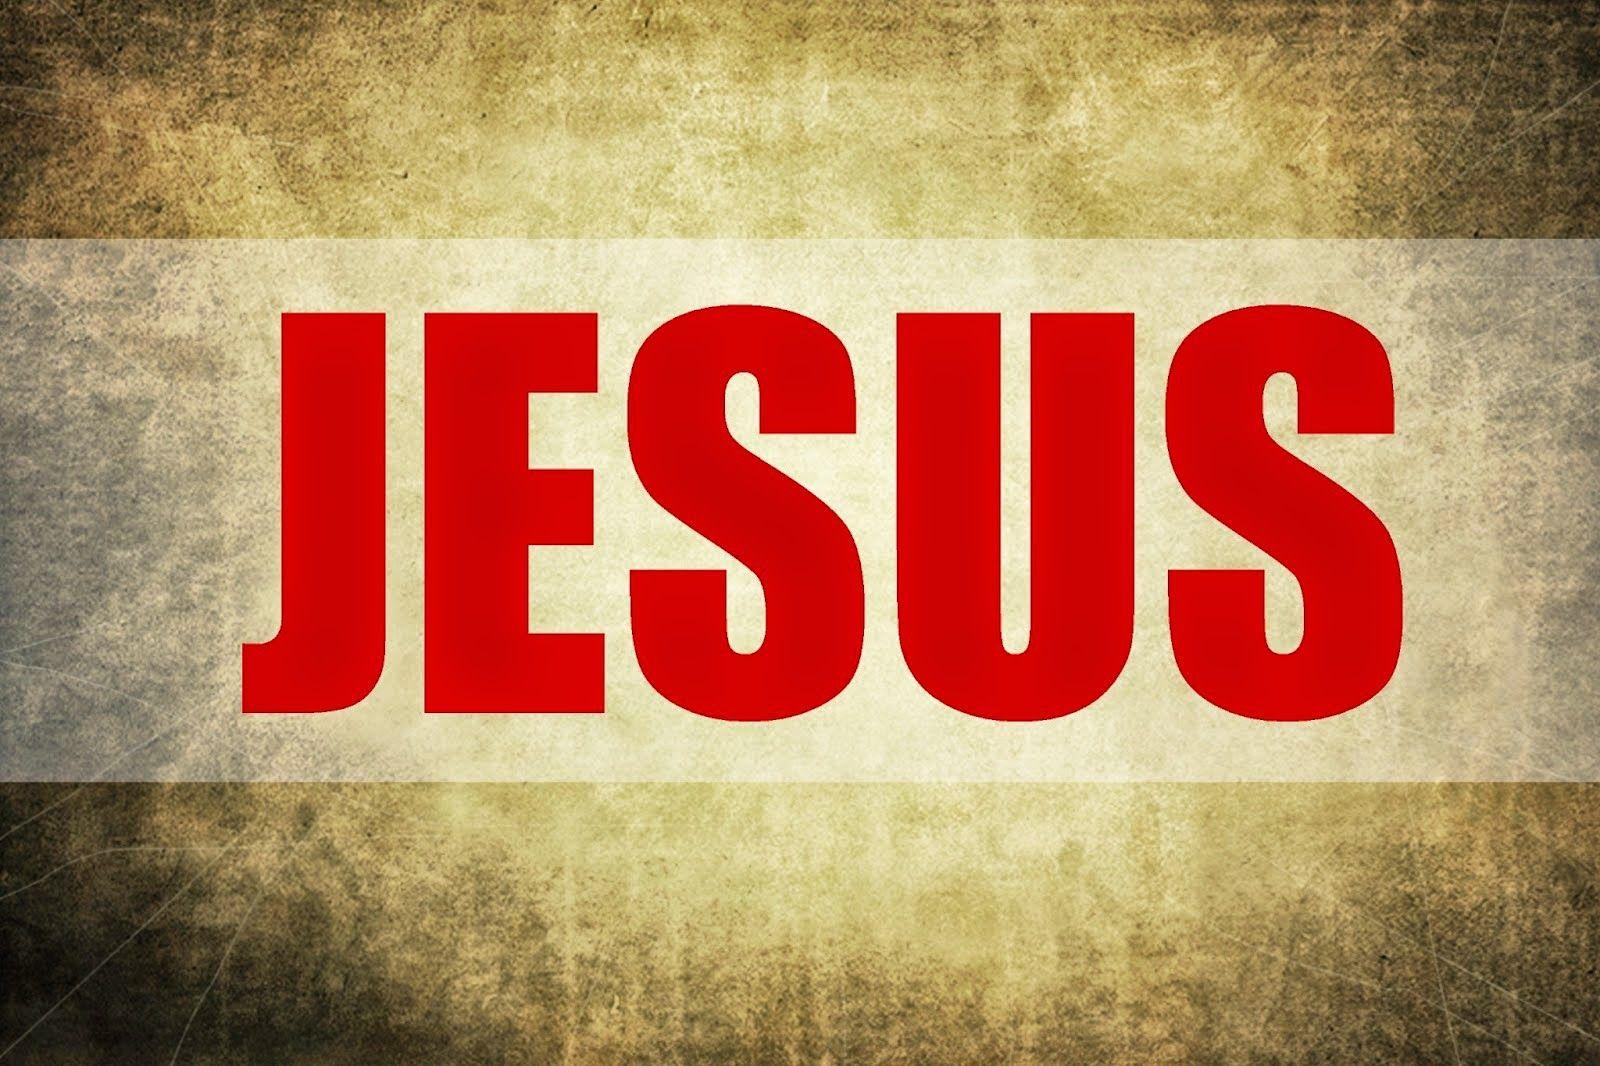 Populares Os Símbolos da Páscoa Cristã - Jesus Cristo | So Jesus salva  TP86